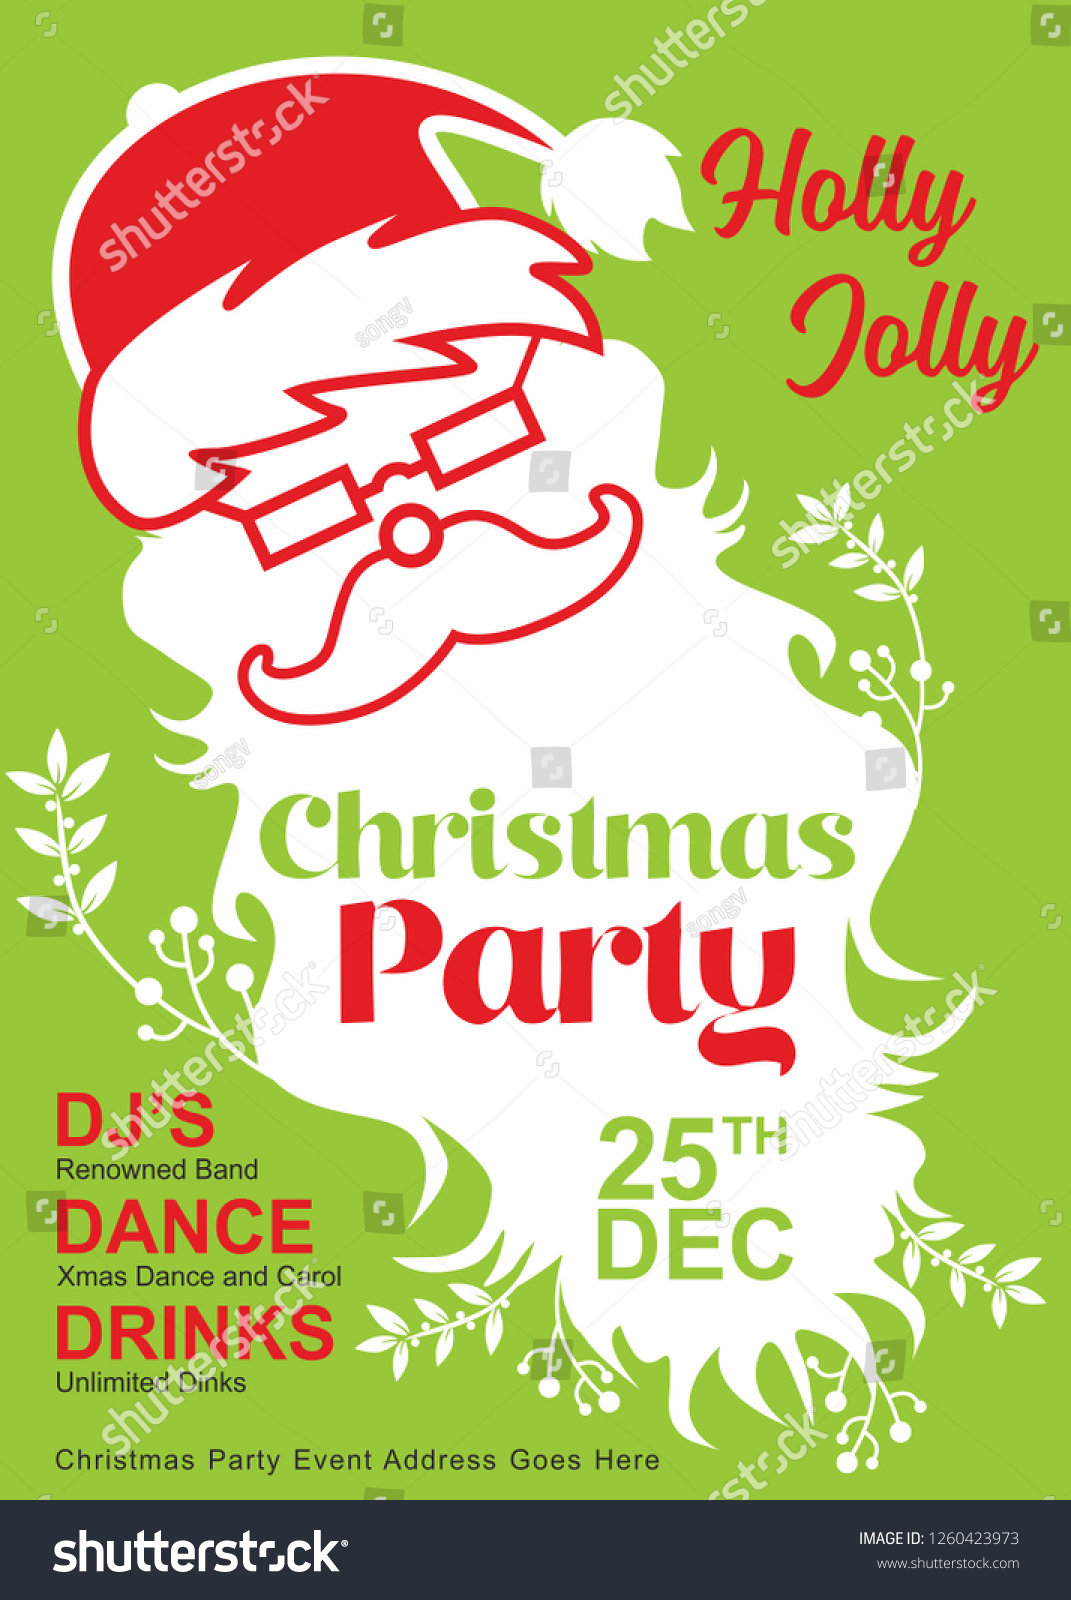 Christmas Party Invite Template Secret Santa Stock Vector Royalty